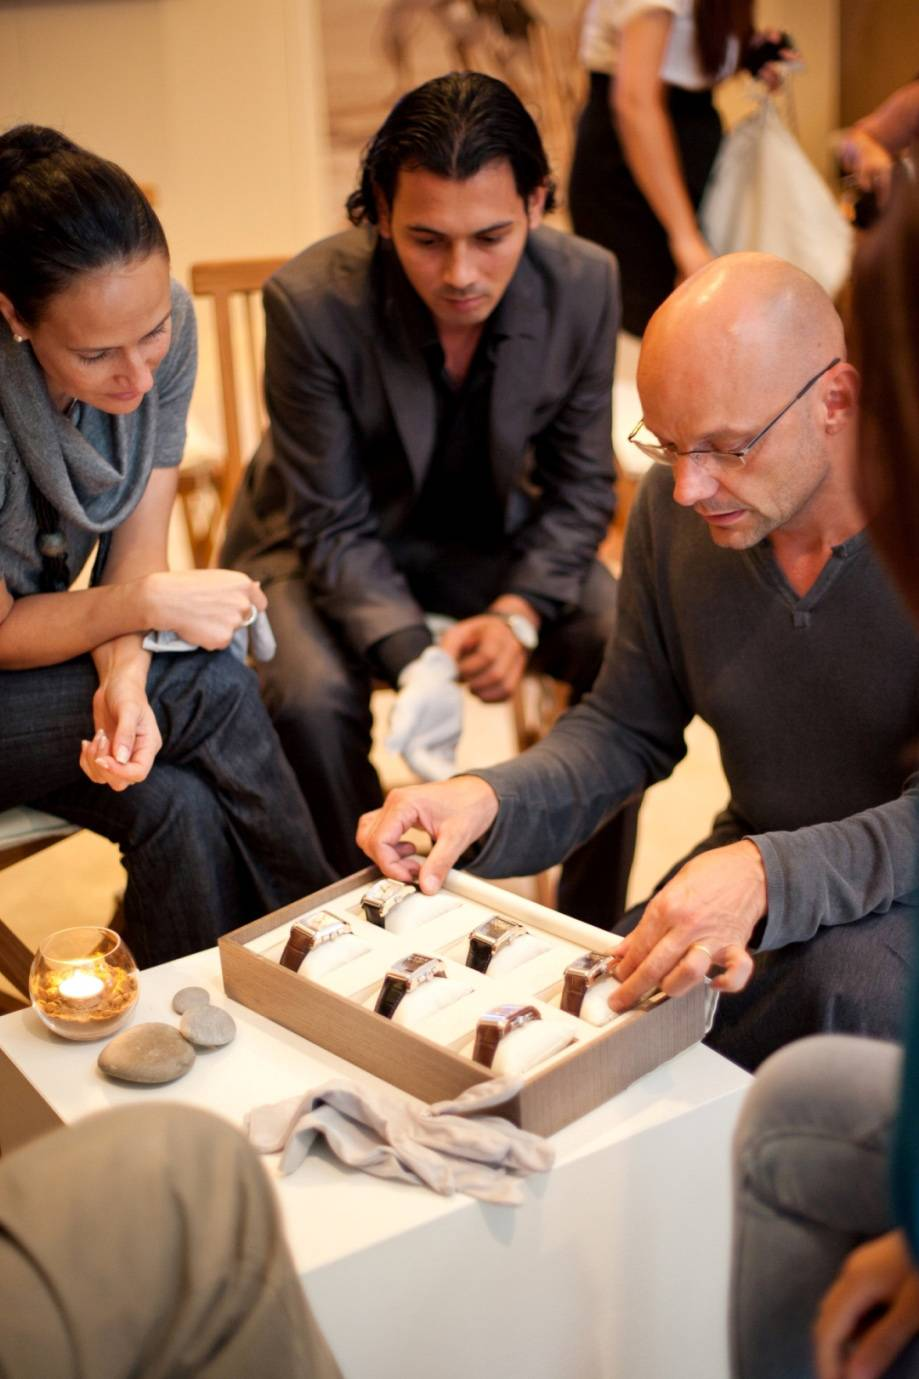 Design_Director_Alexandre_Peraldi_and_guests_jpg[1] Baume & Mercier